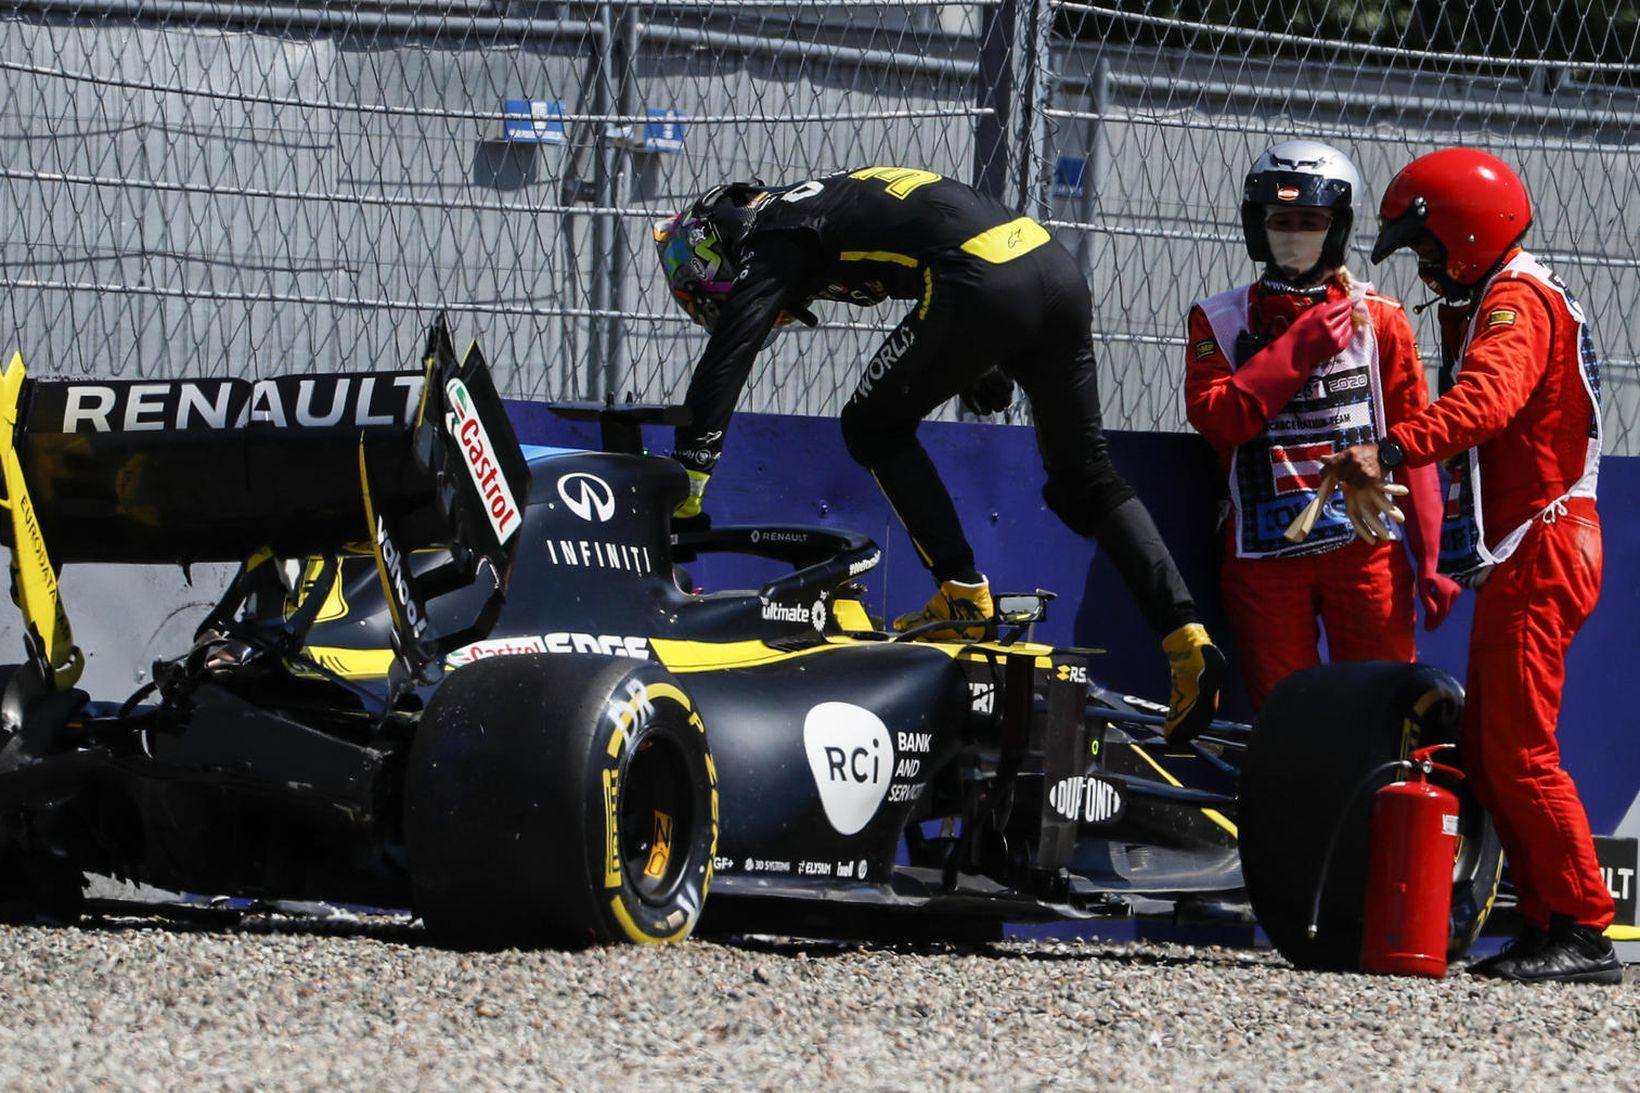 Daniel Ricciardo stígur upp úr Renaultbíl sínum í Spielberg í …